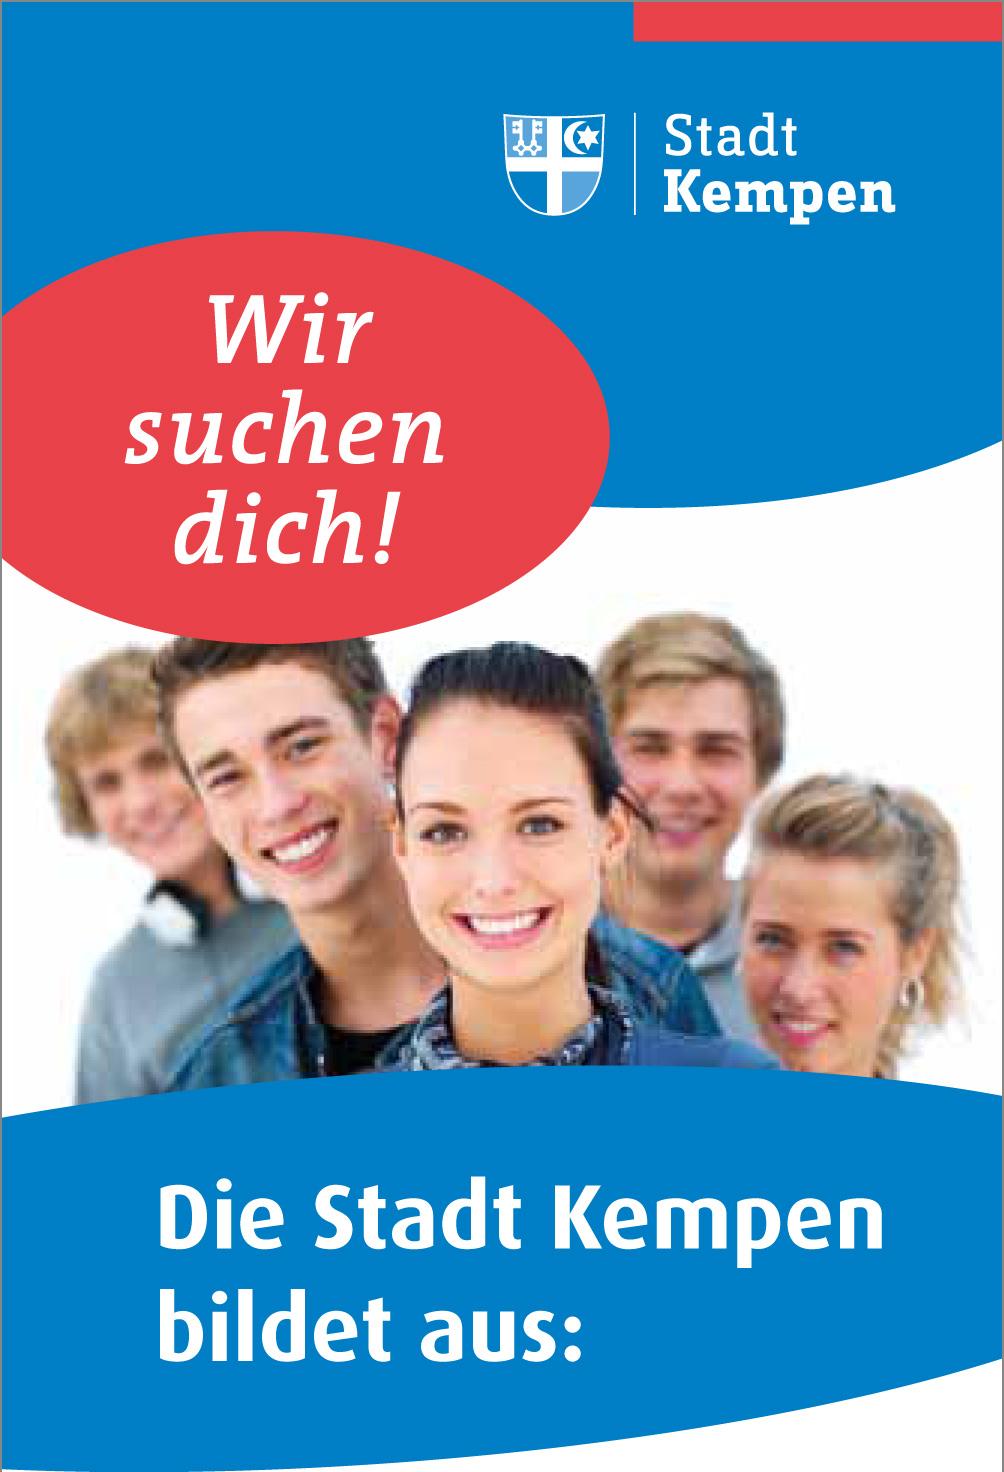 Stadt Kempen Ausbildungsangebot